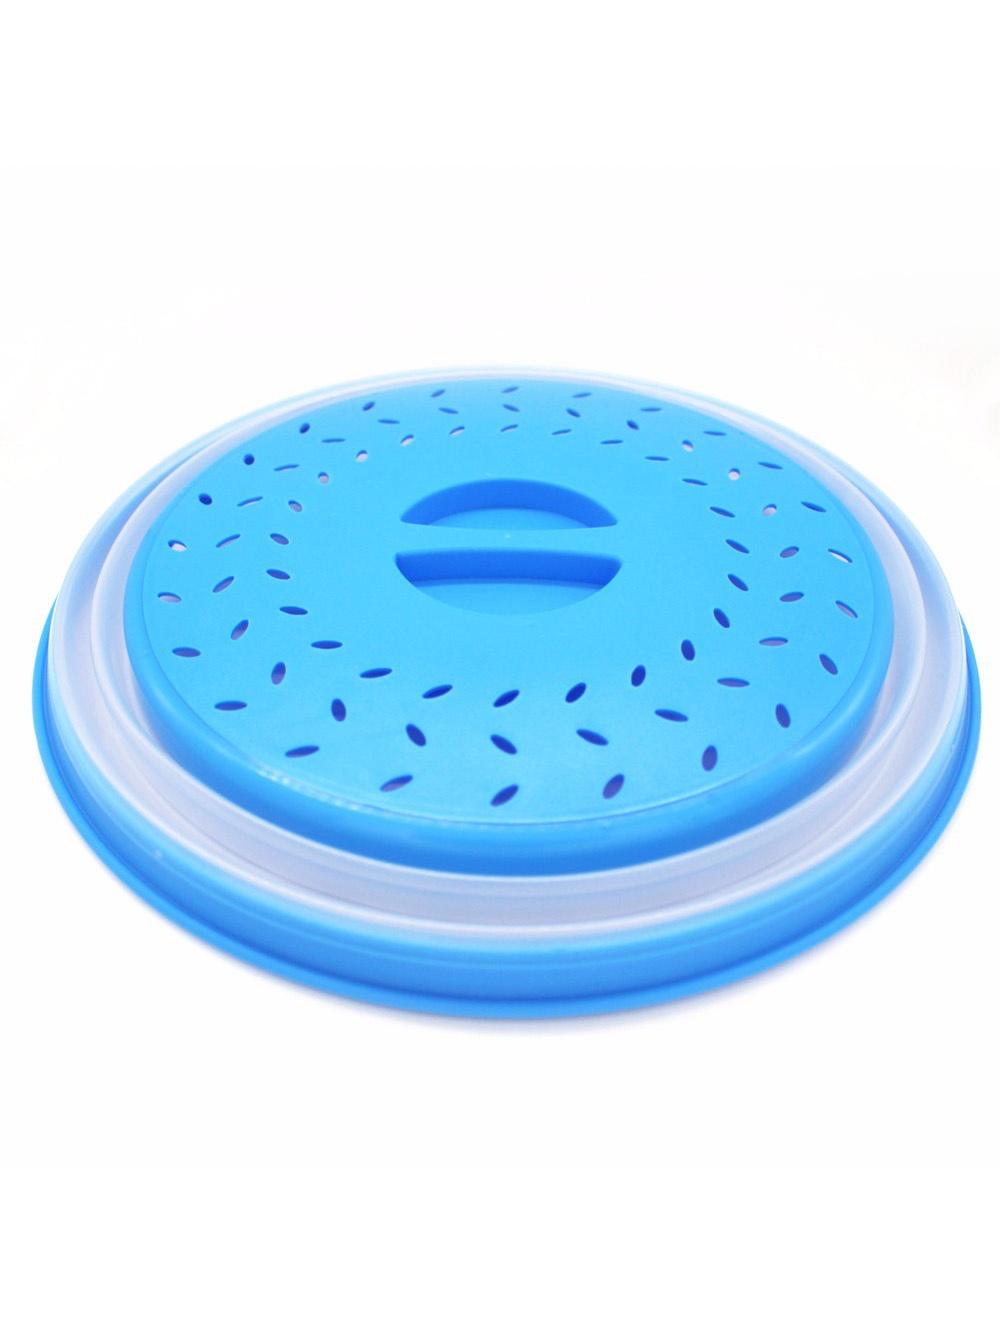 Крышка KitchenAngel KA-MWC-01, синий